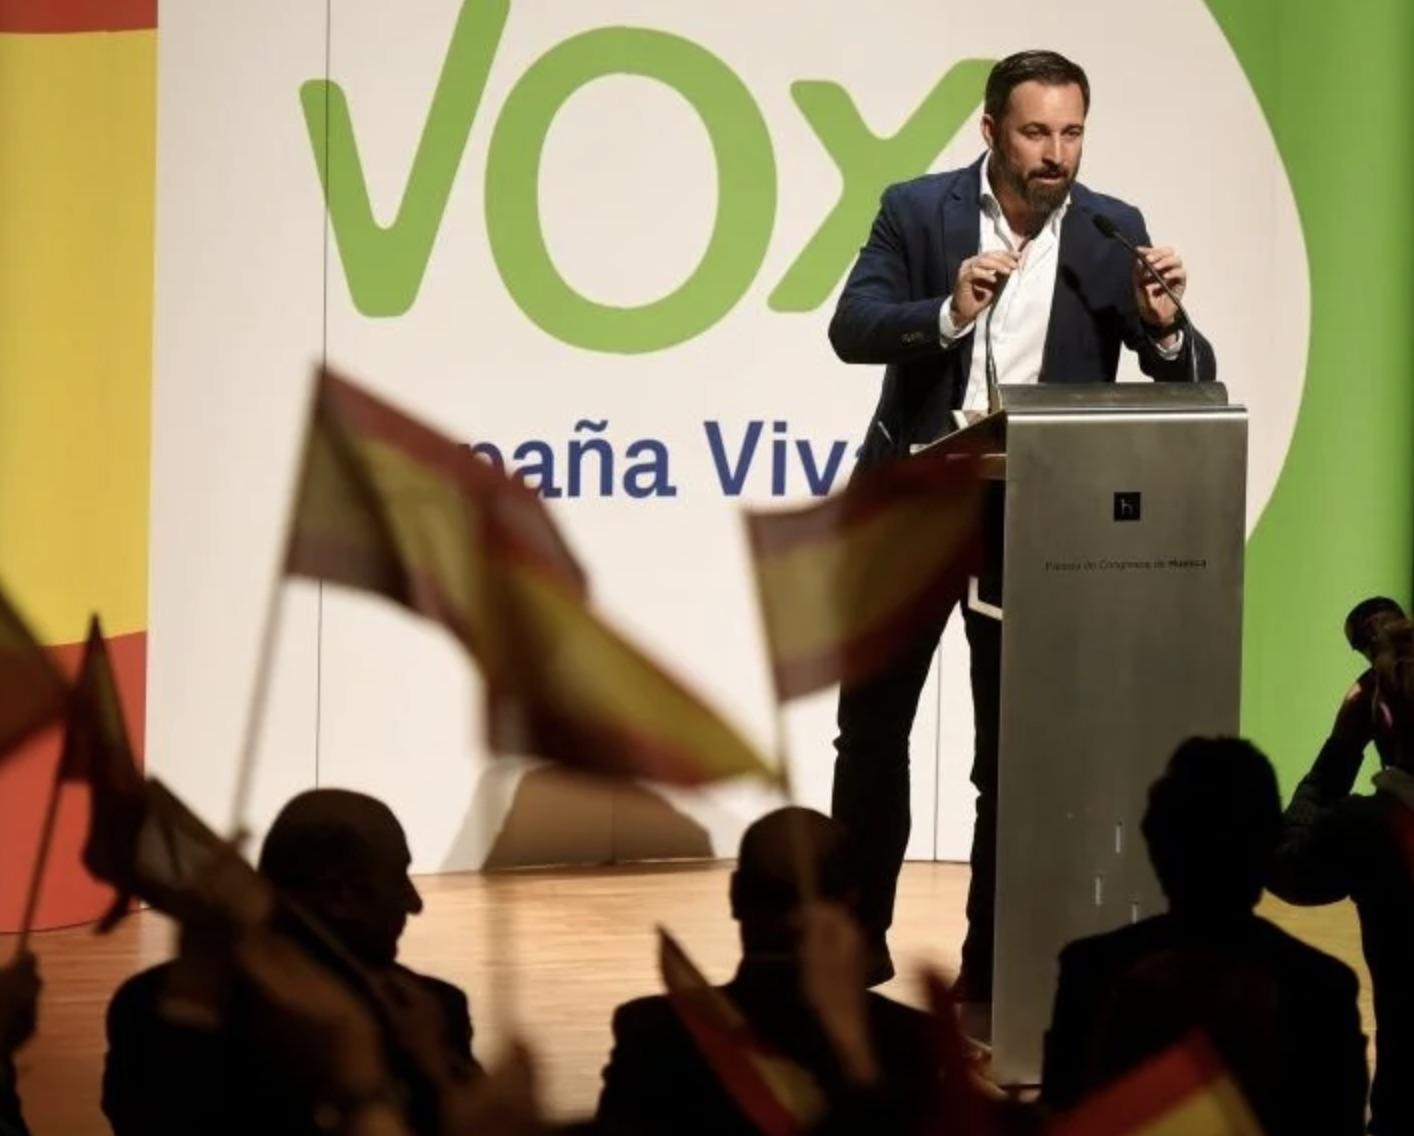 Santiago Abascal, VOX